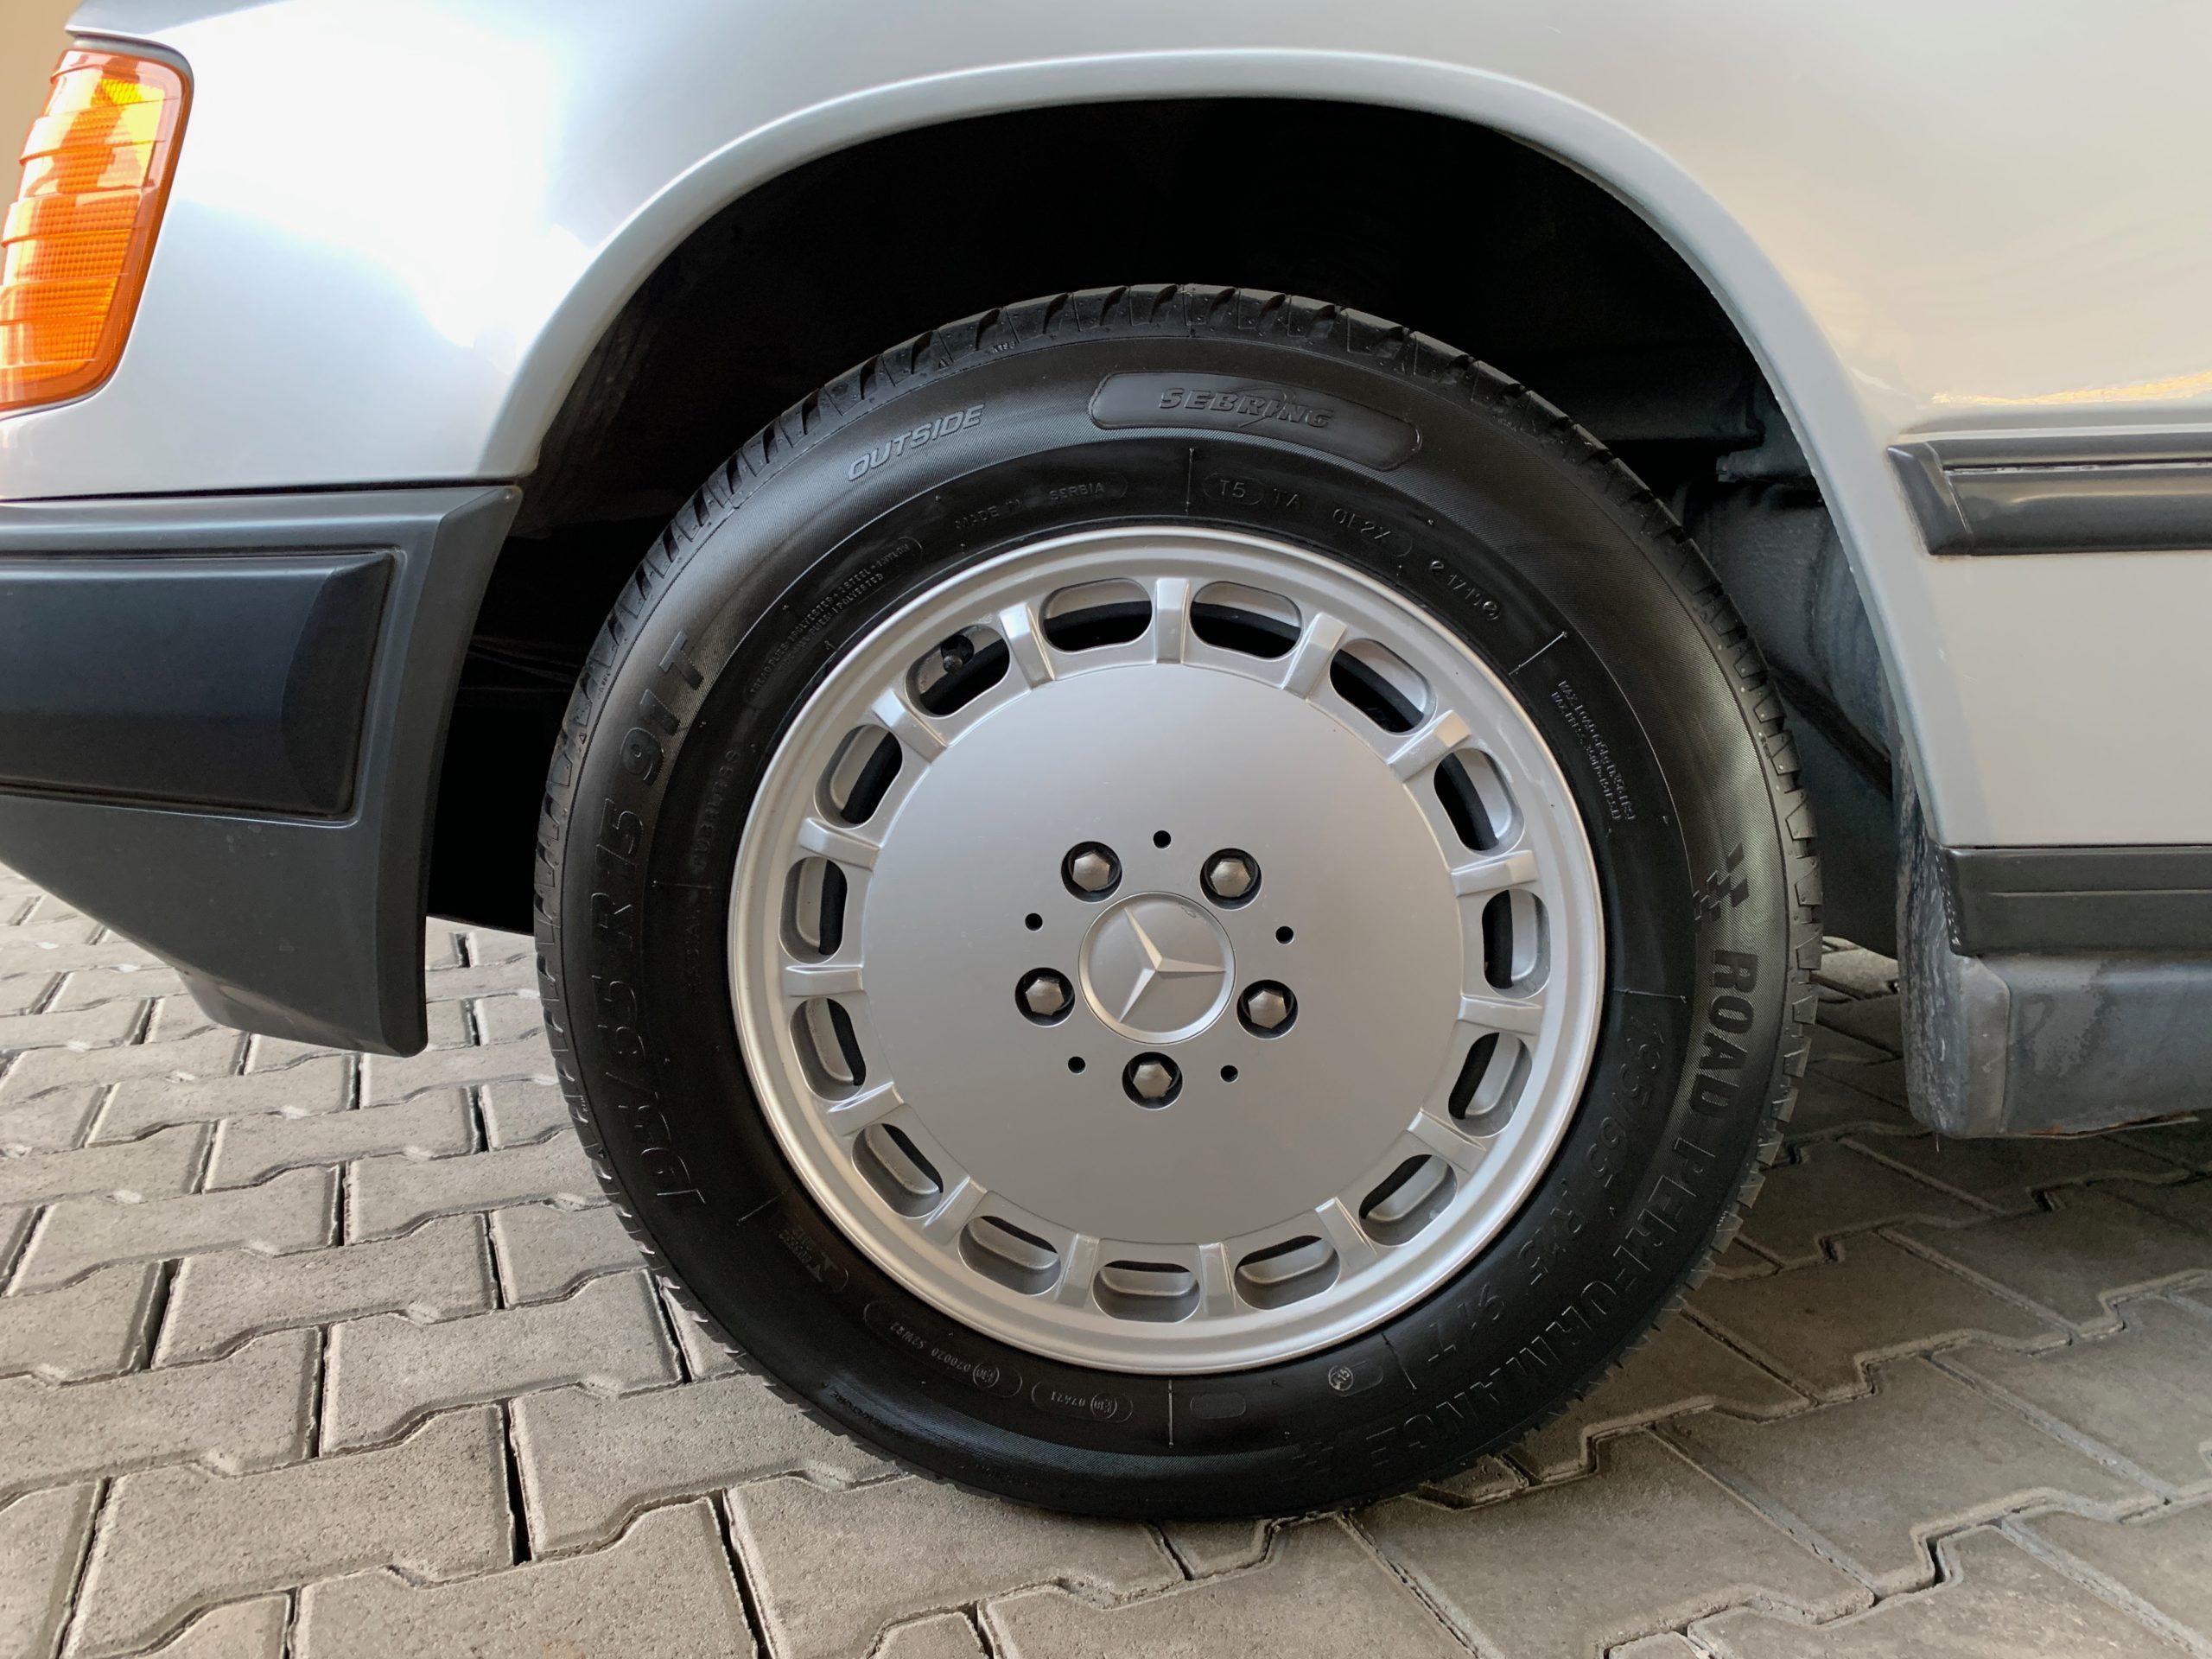 Mercedes Benz W124 260 E Automatik Schiebedach full